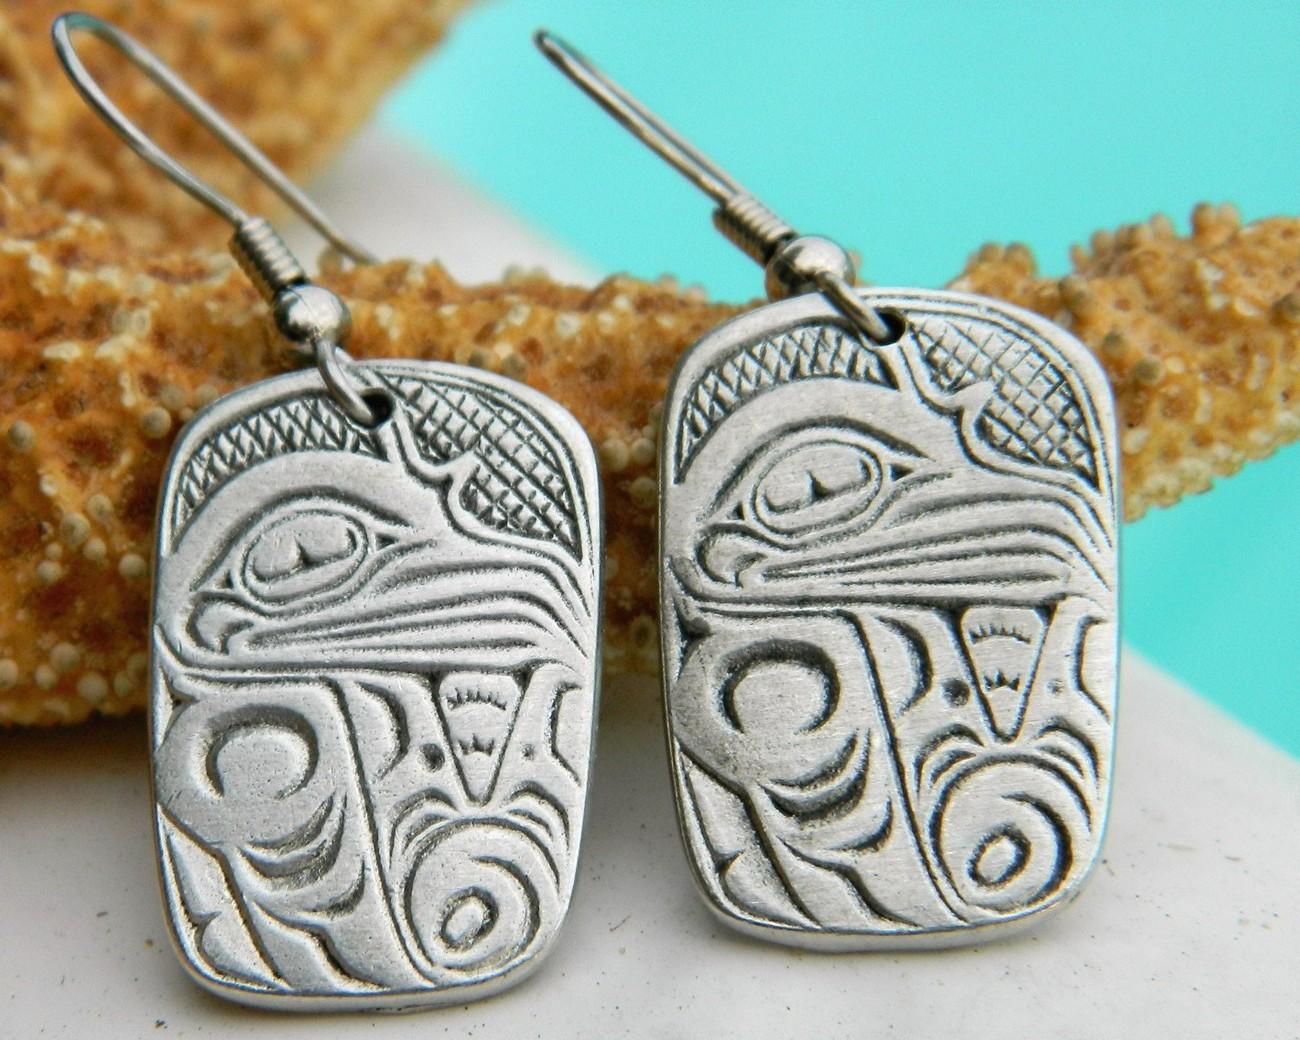 Aztec_eagle_bird_symbol_earrings_cuauhtli_pewter